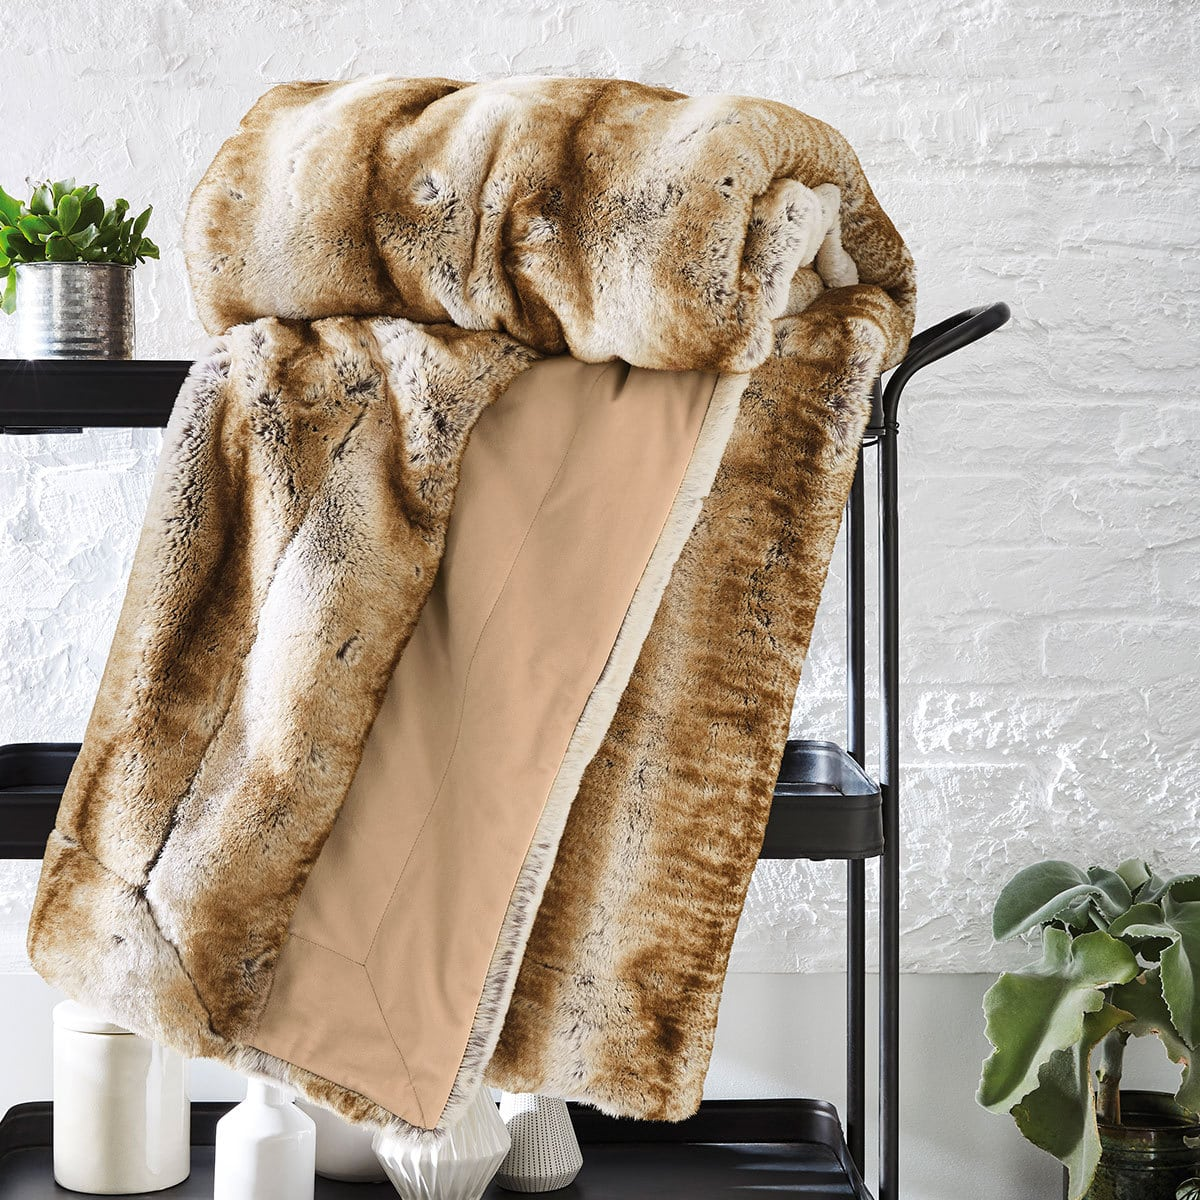 bugatti felldecke zobel braun gestreift g nstig online kaufen bei bettwaren shop. Black Bedroom Furniture Sets. Home Design Ideas